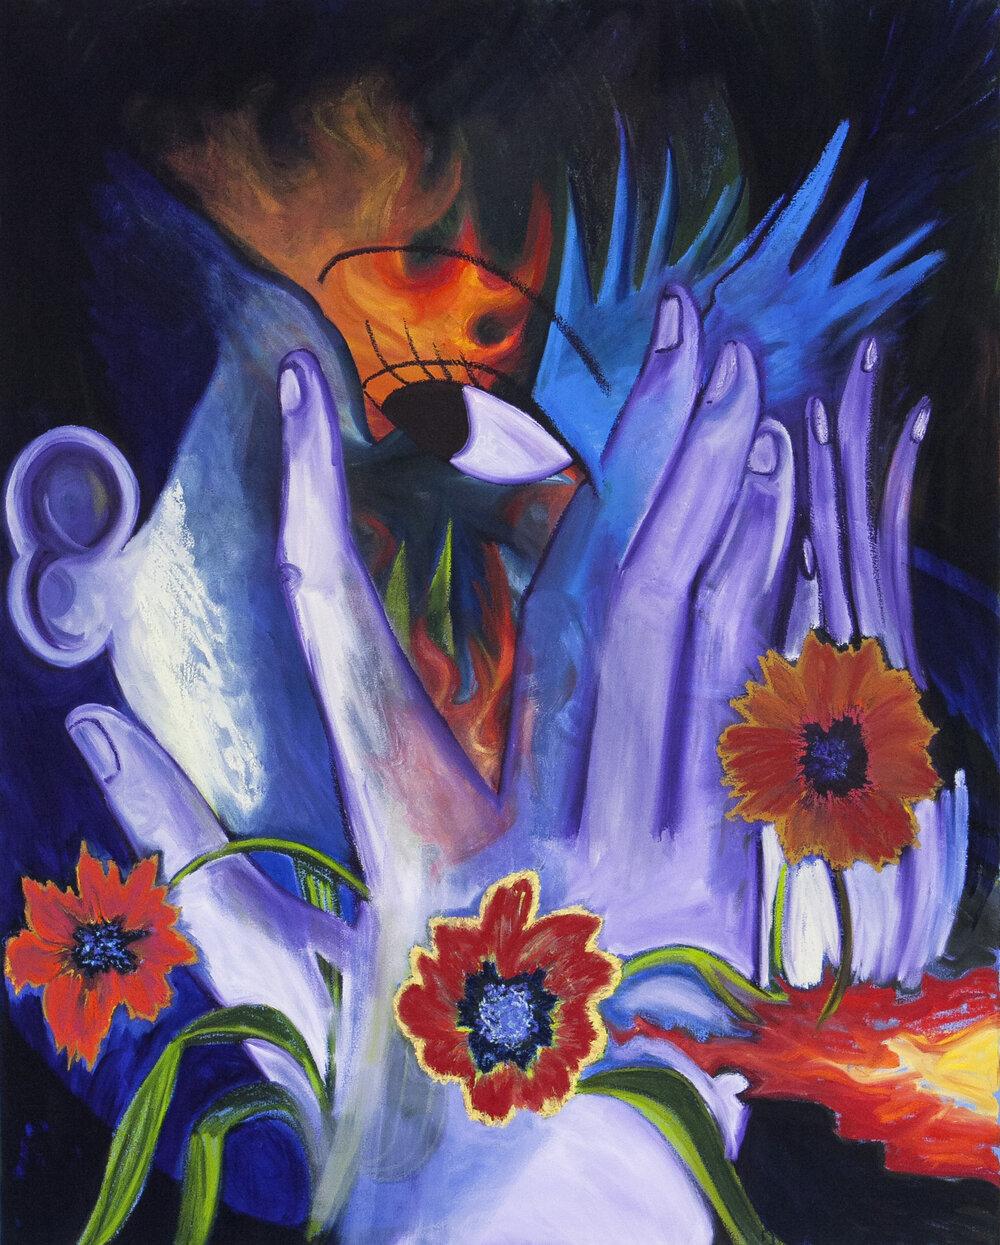 "Inner Fire, oil on canvas, 48"" x 60"", 2019"